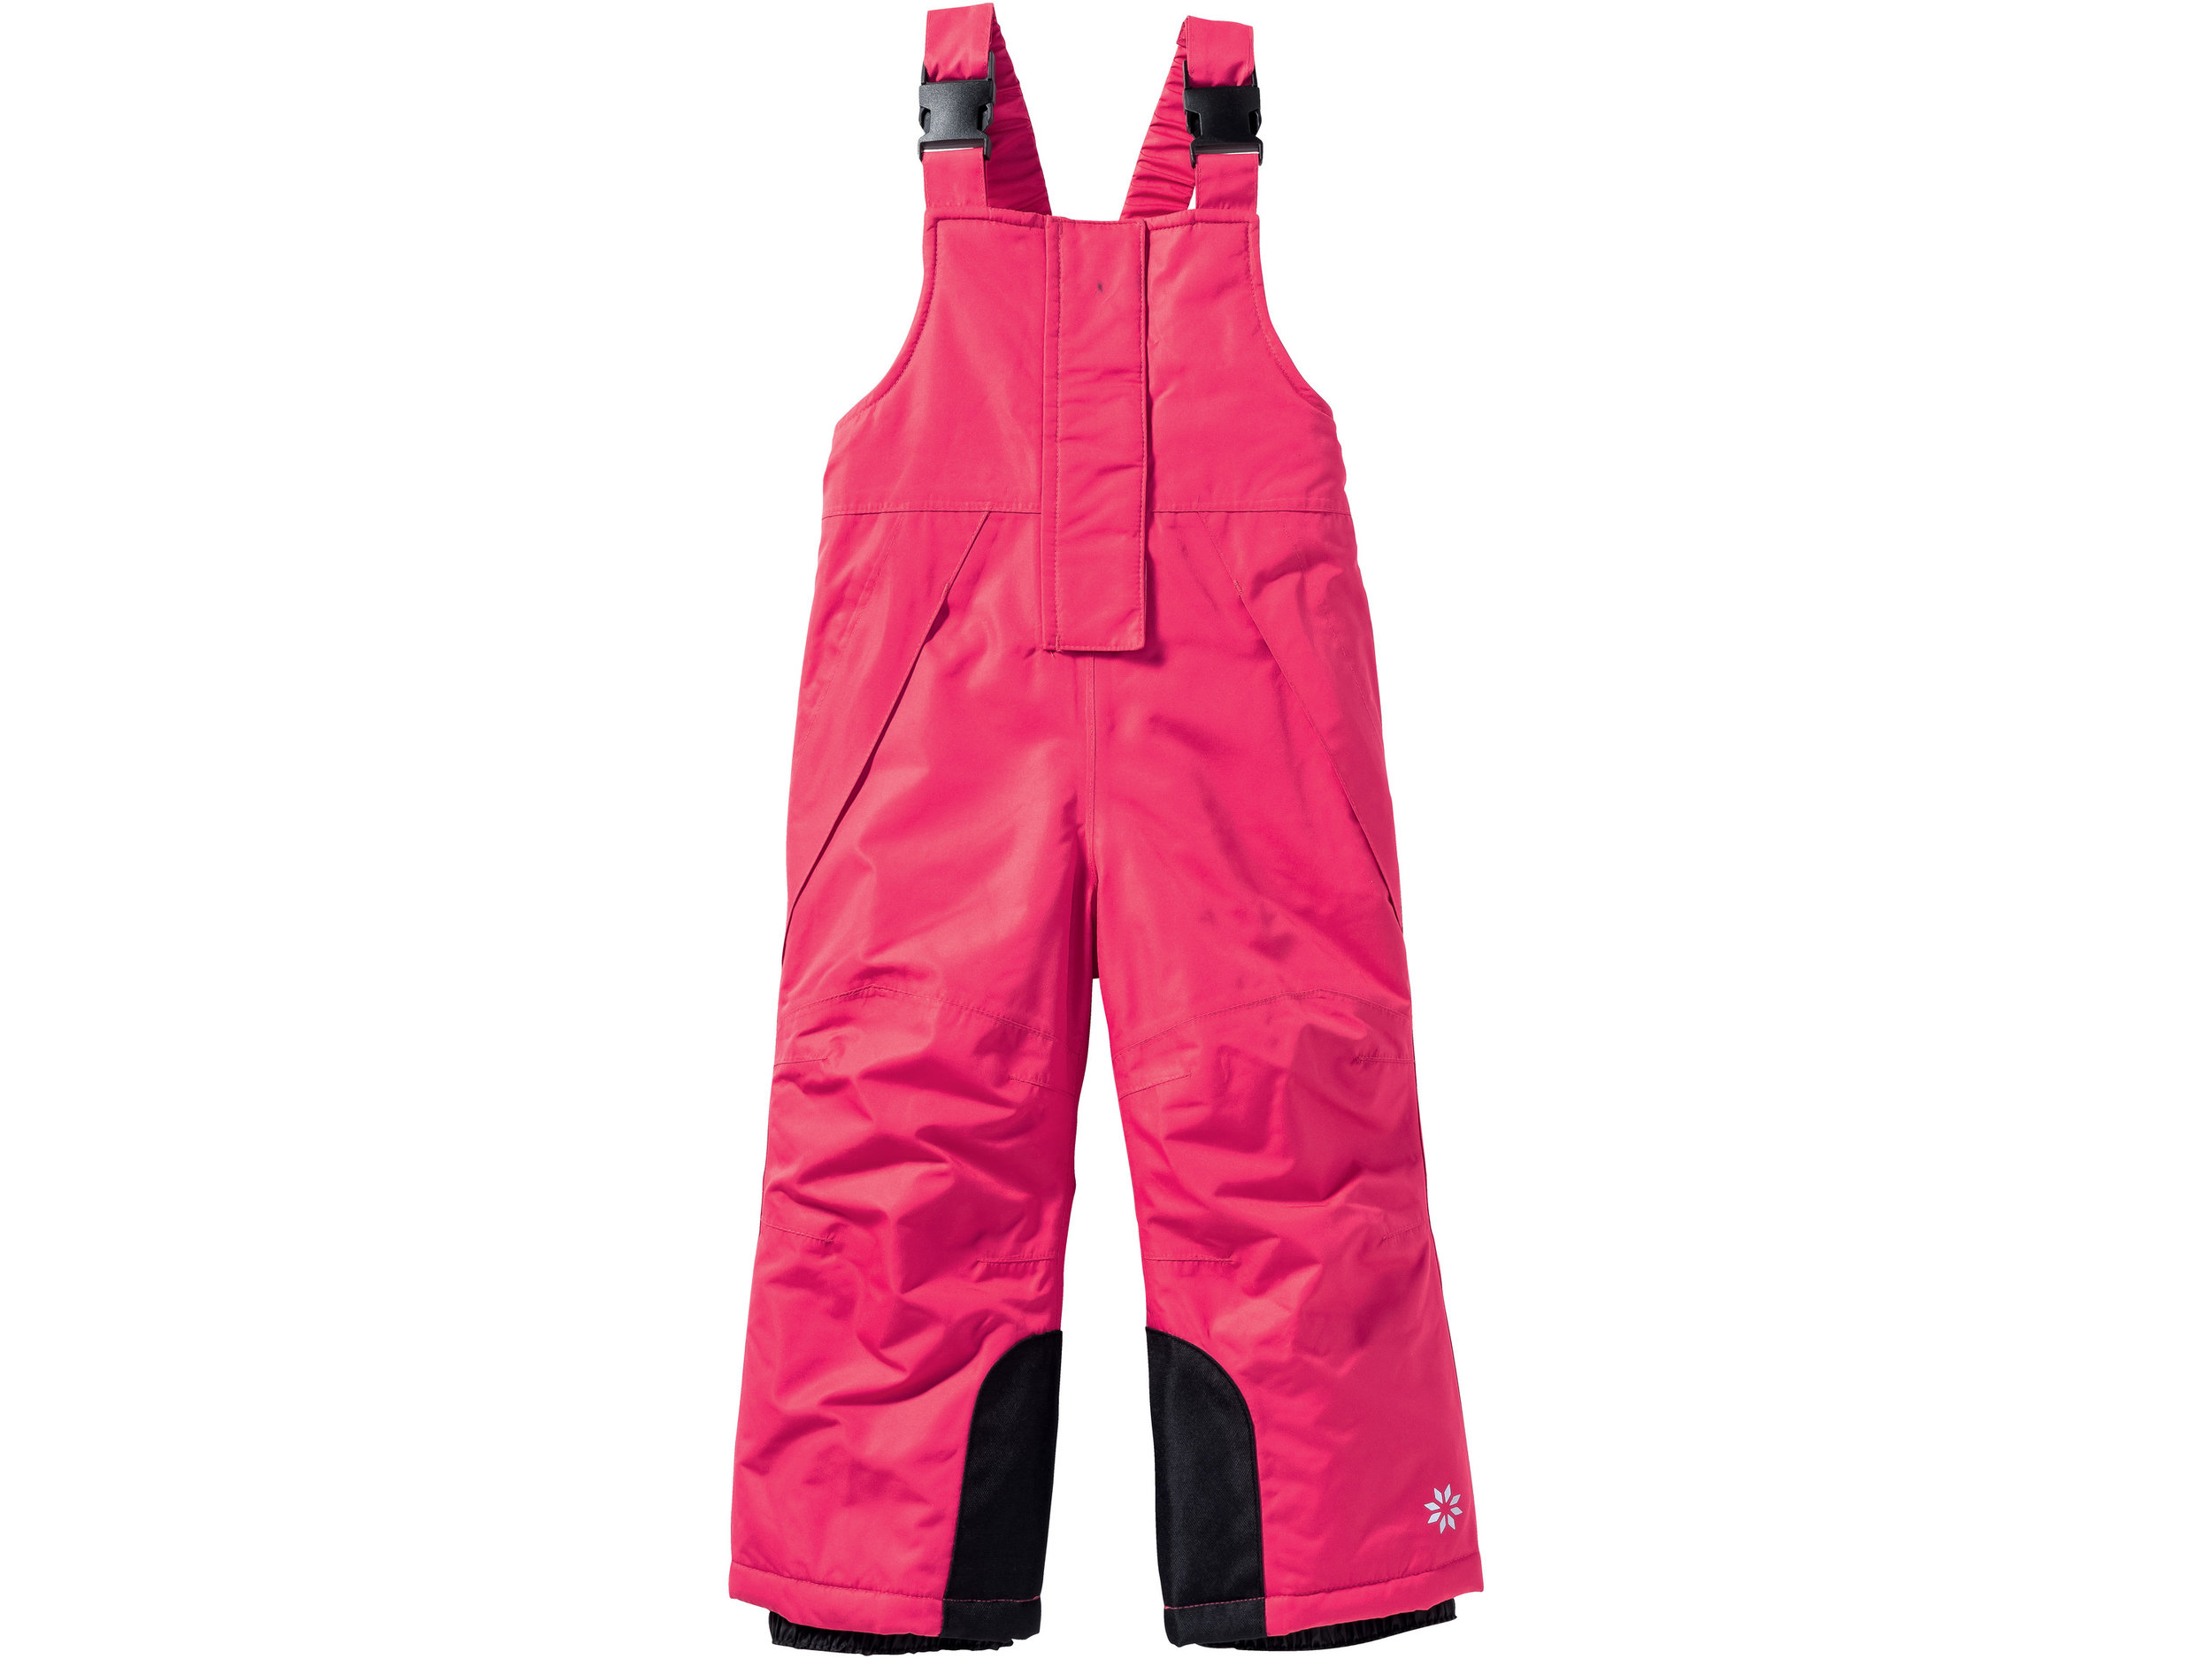 Kids' Ski Trousers £8.99 (1).JPG